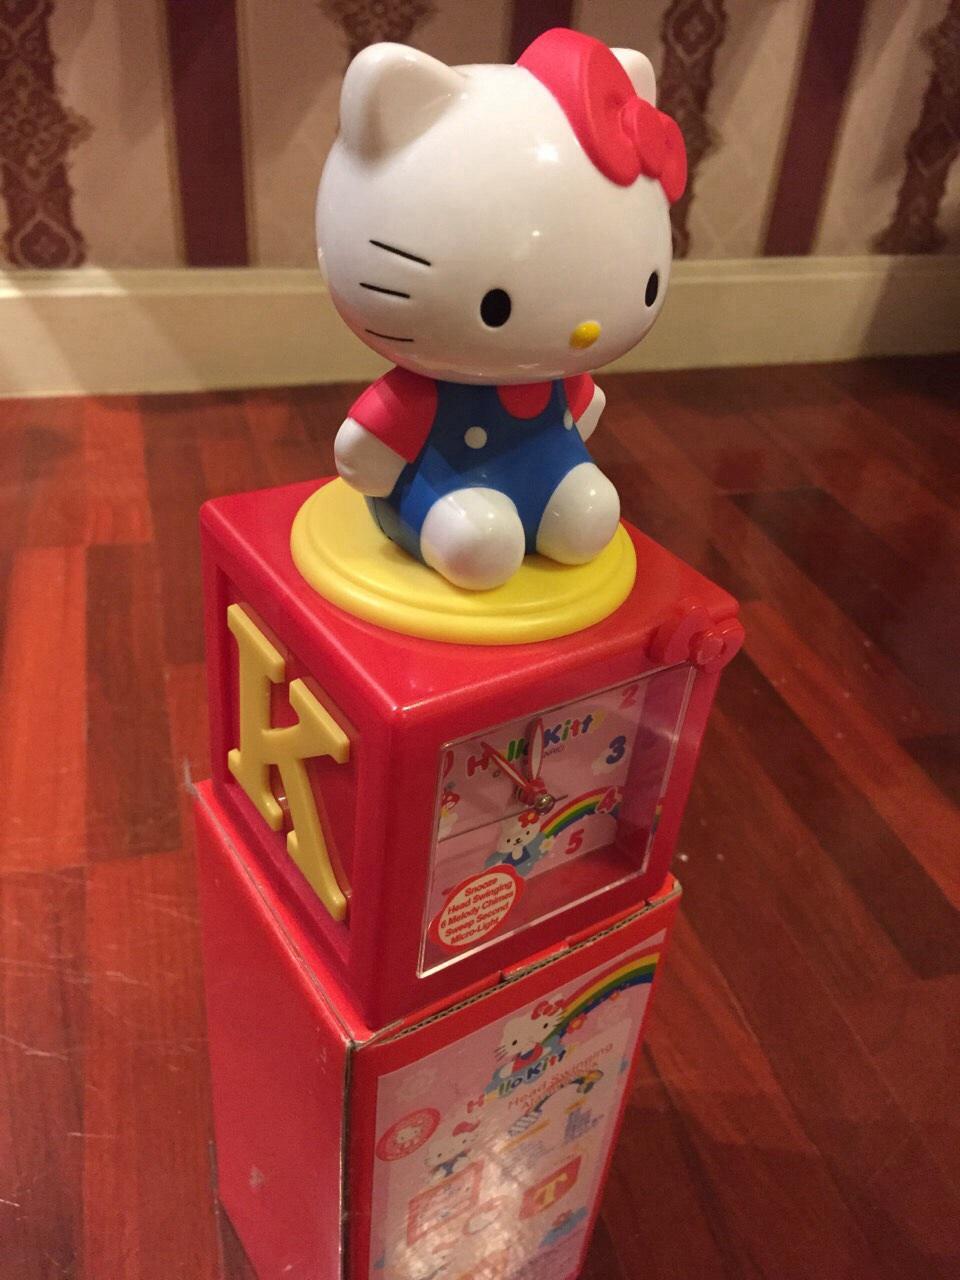 Sale โล๊ะสต้อคเช่นhello kitty/Tabo/Disney /Thomas/car